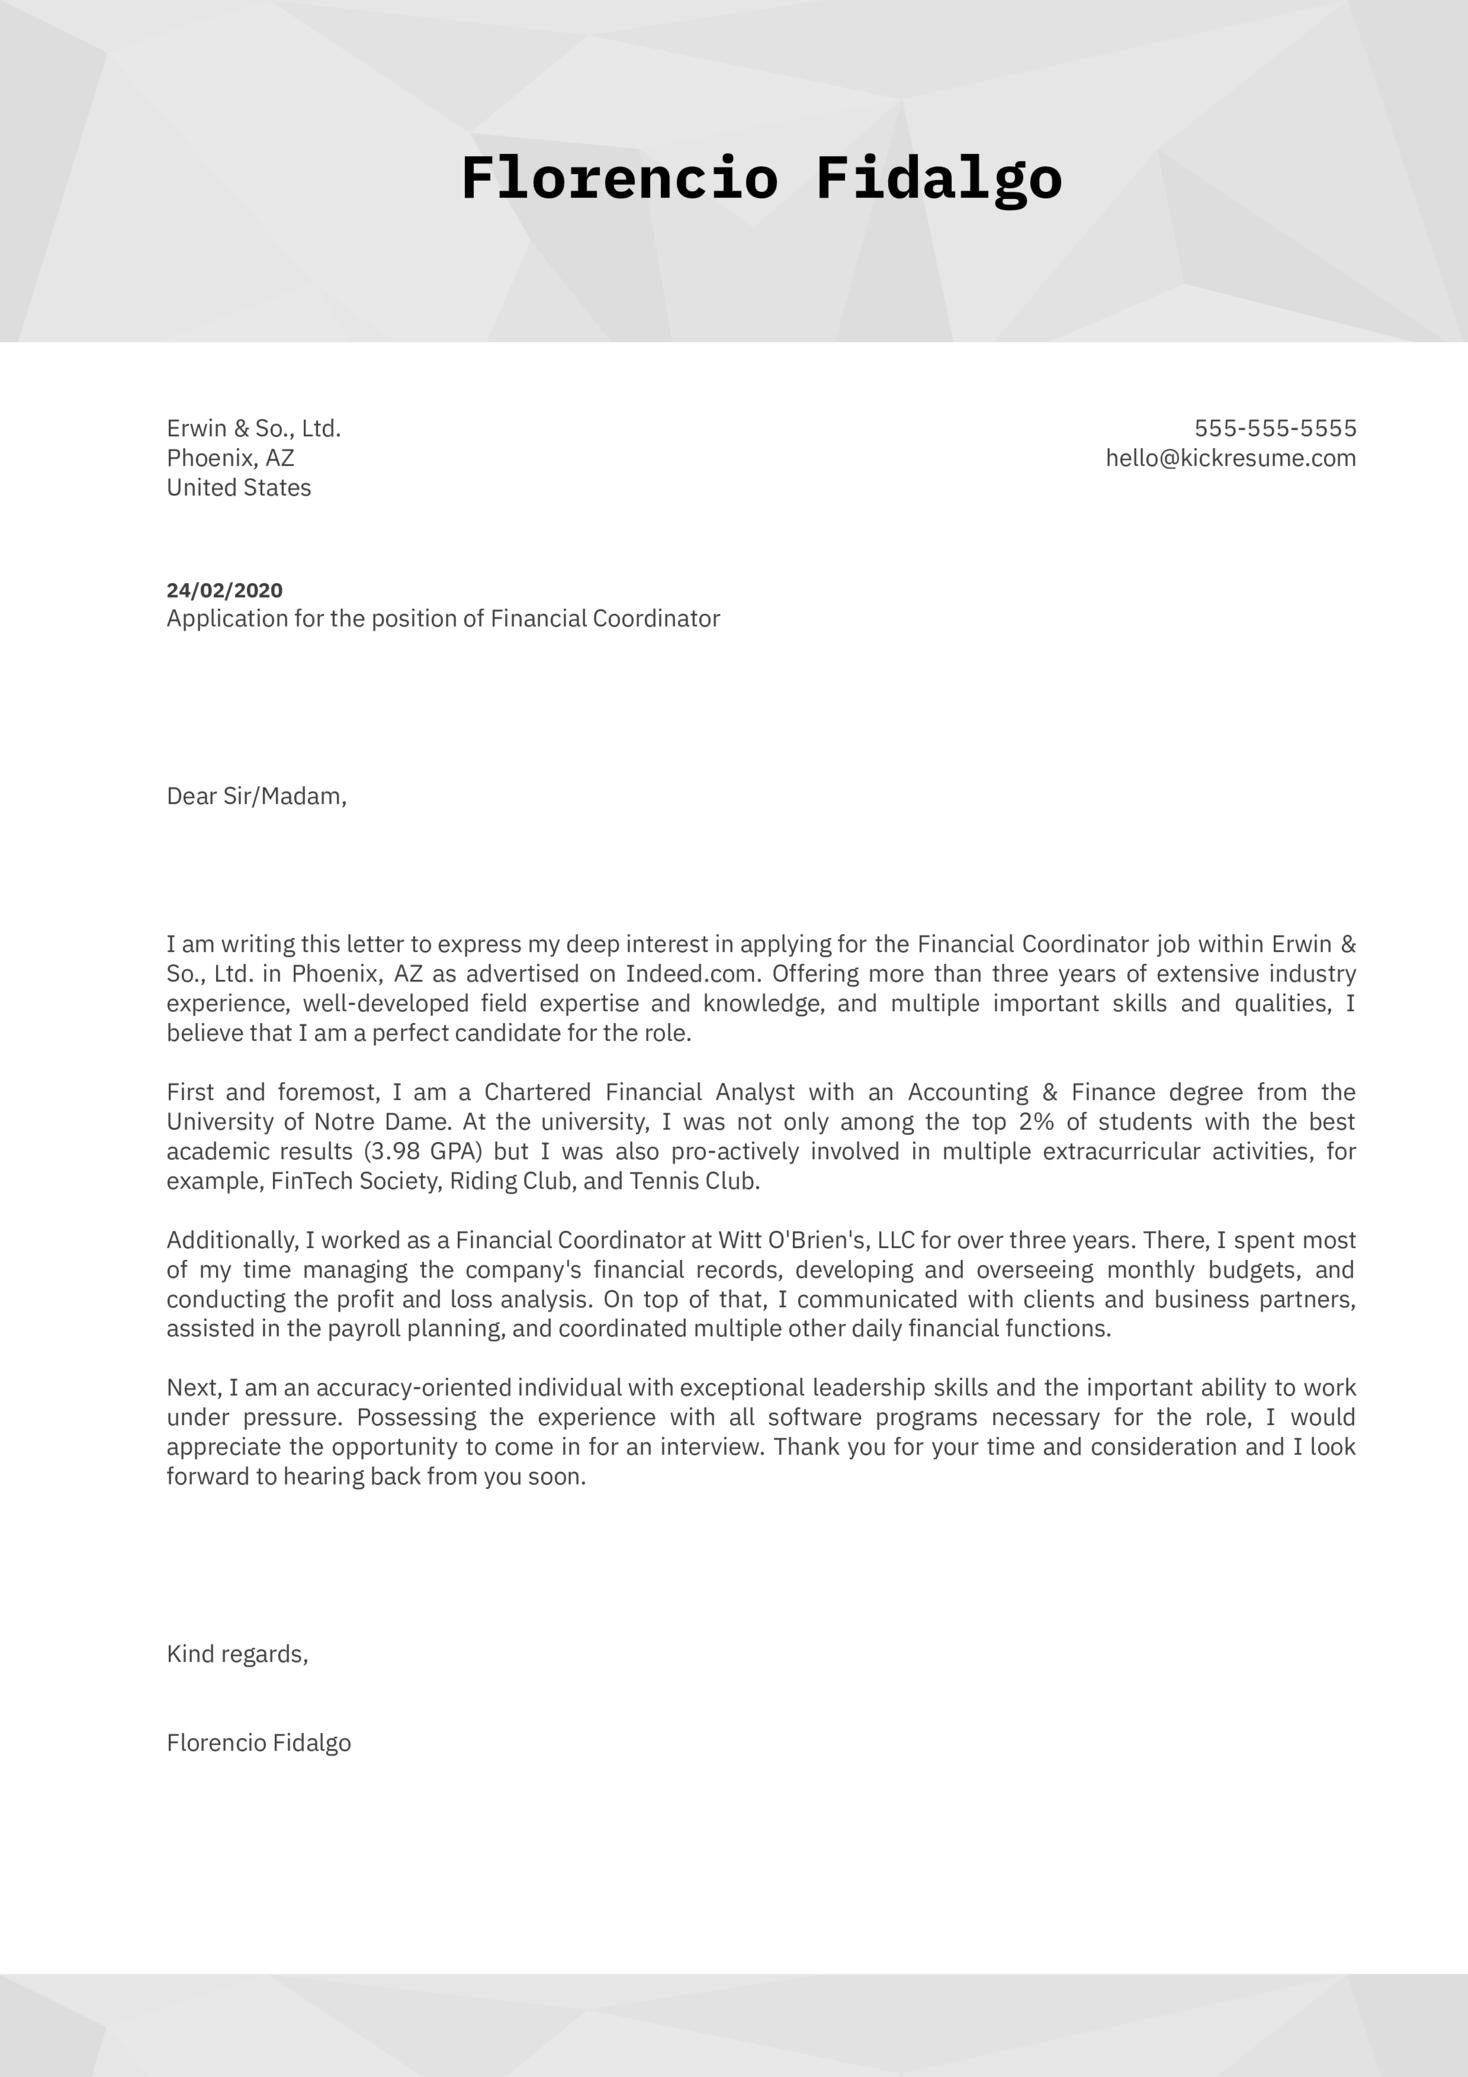 Financial Coordinator Cover Letter Sample